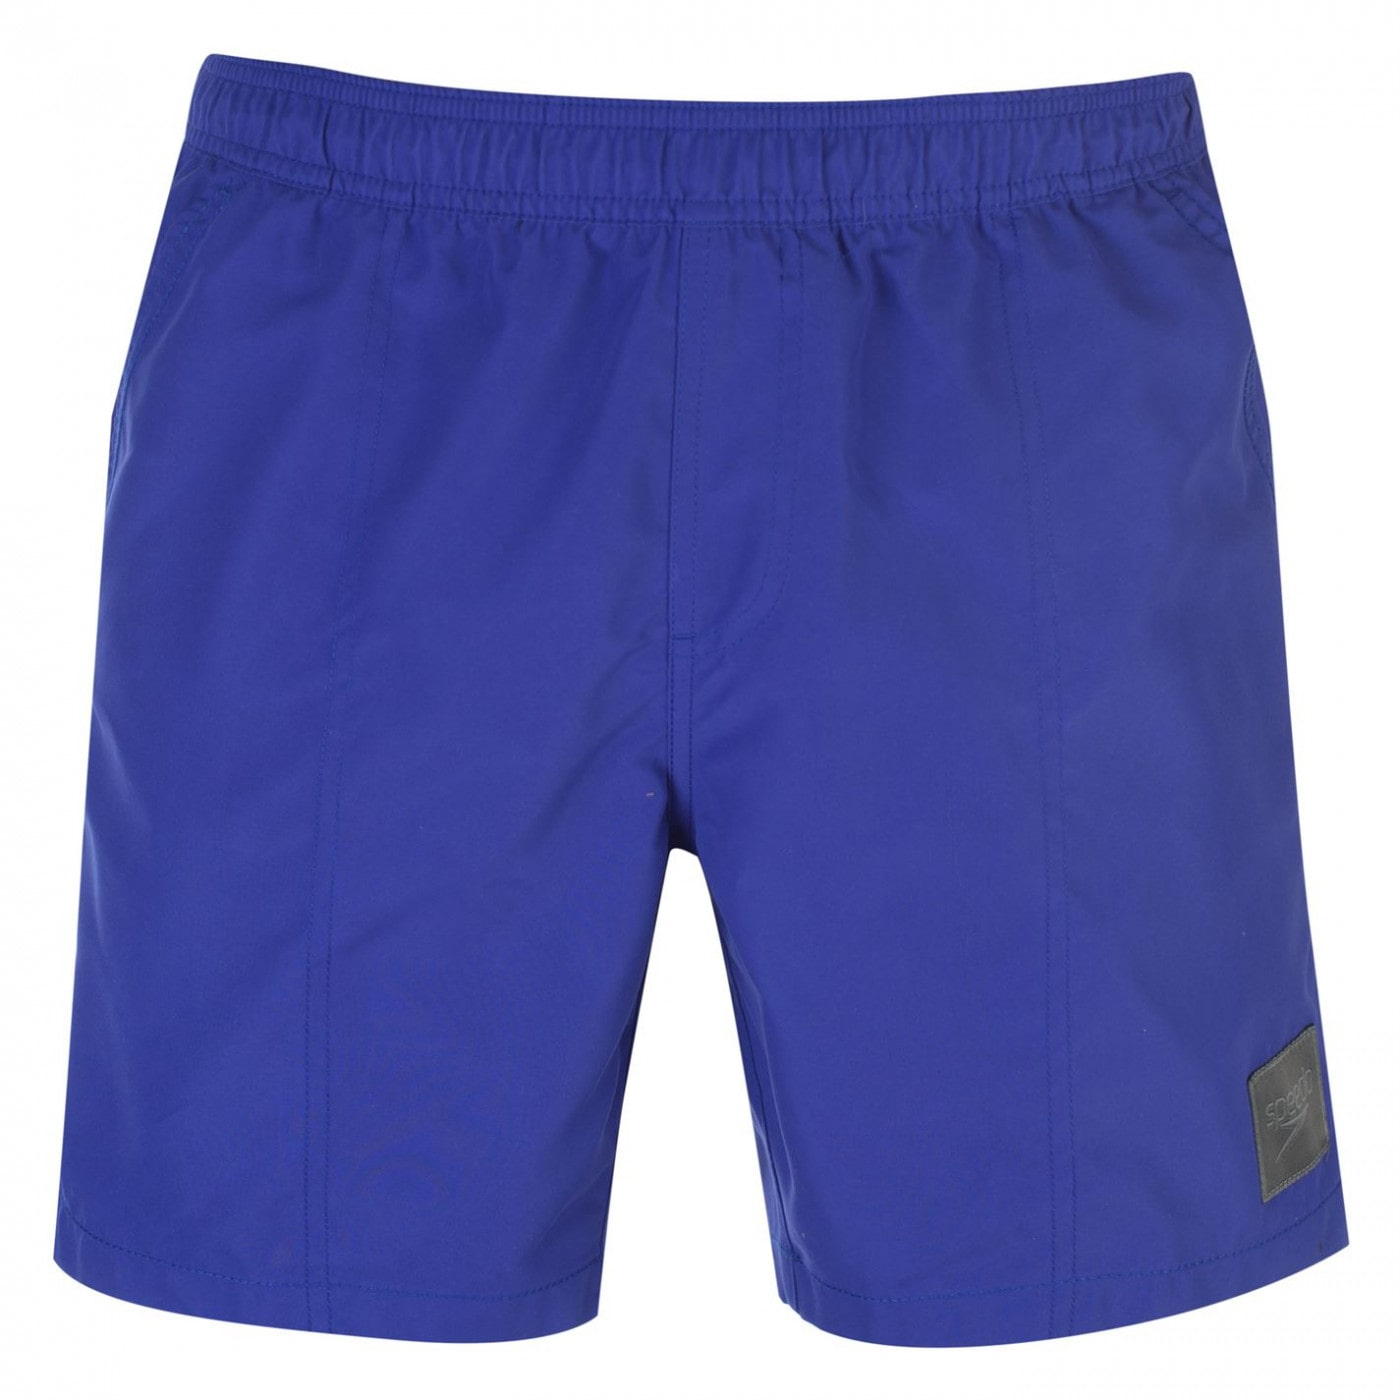 Men's swimwear Speedo SnrC99